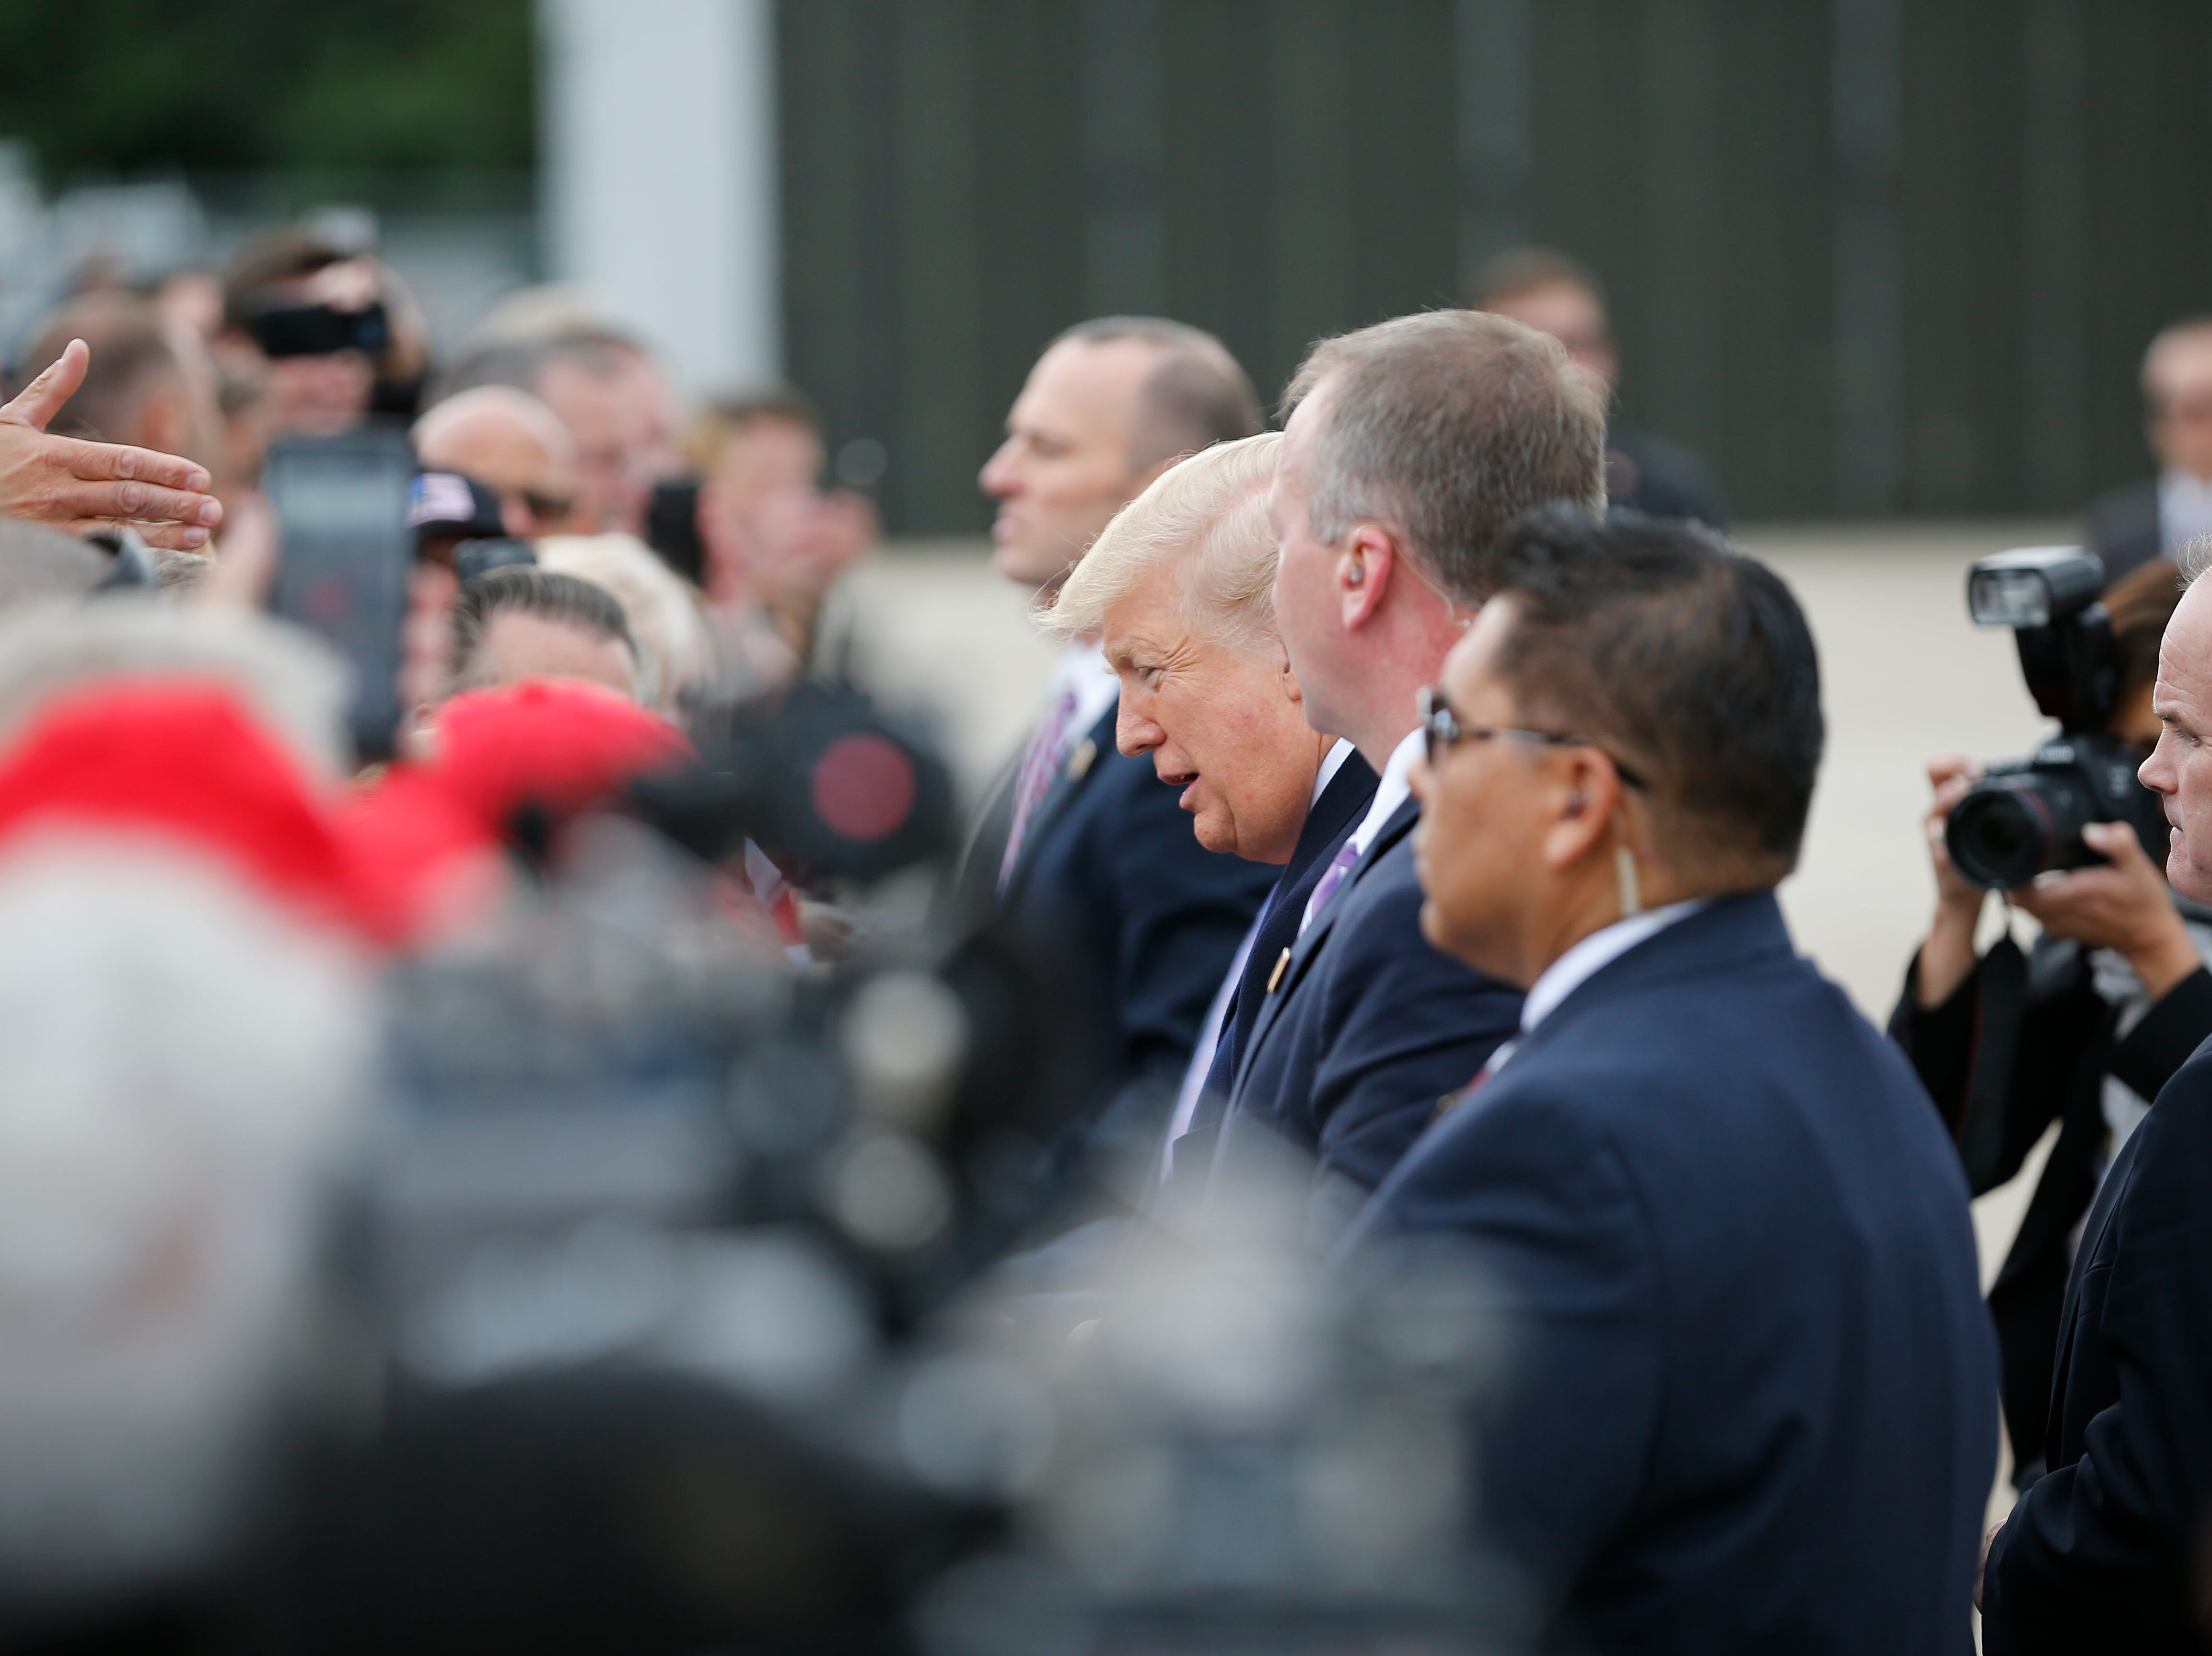 Donald Trump greets people as he arrives in Cincinnati